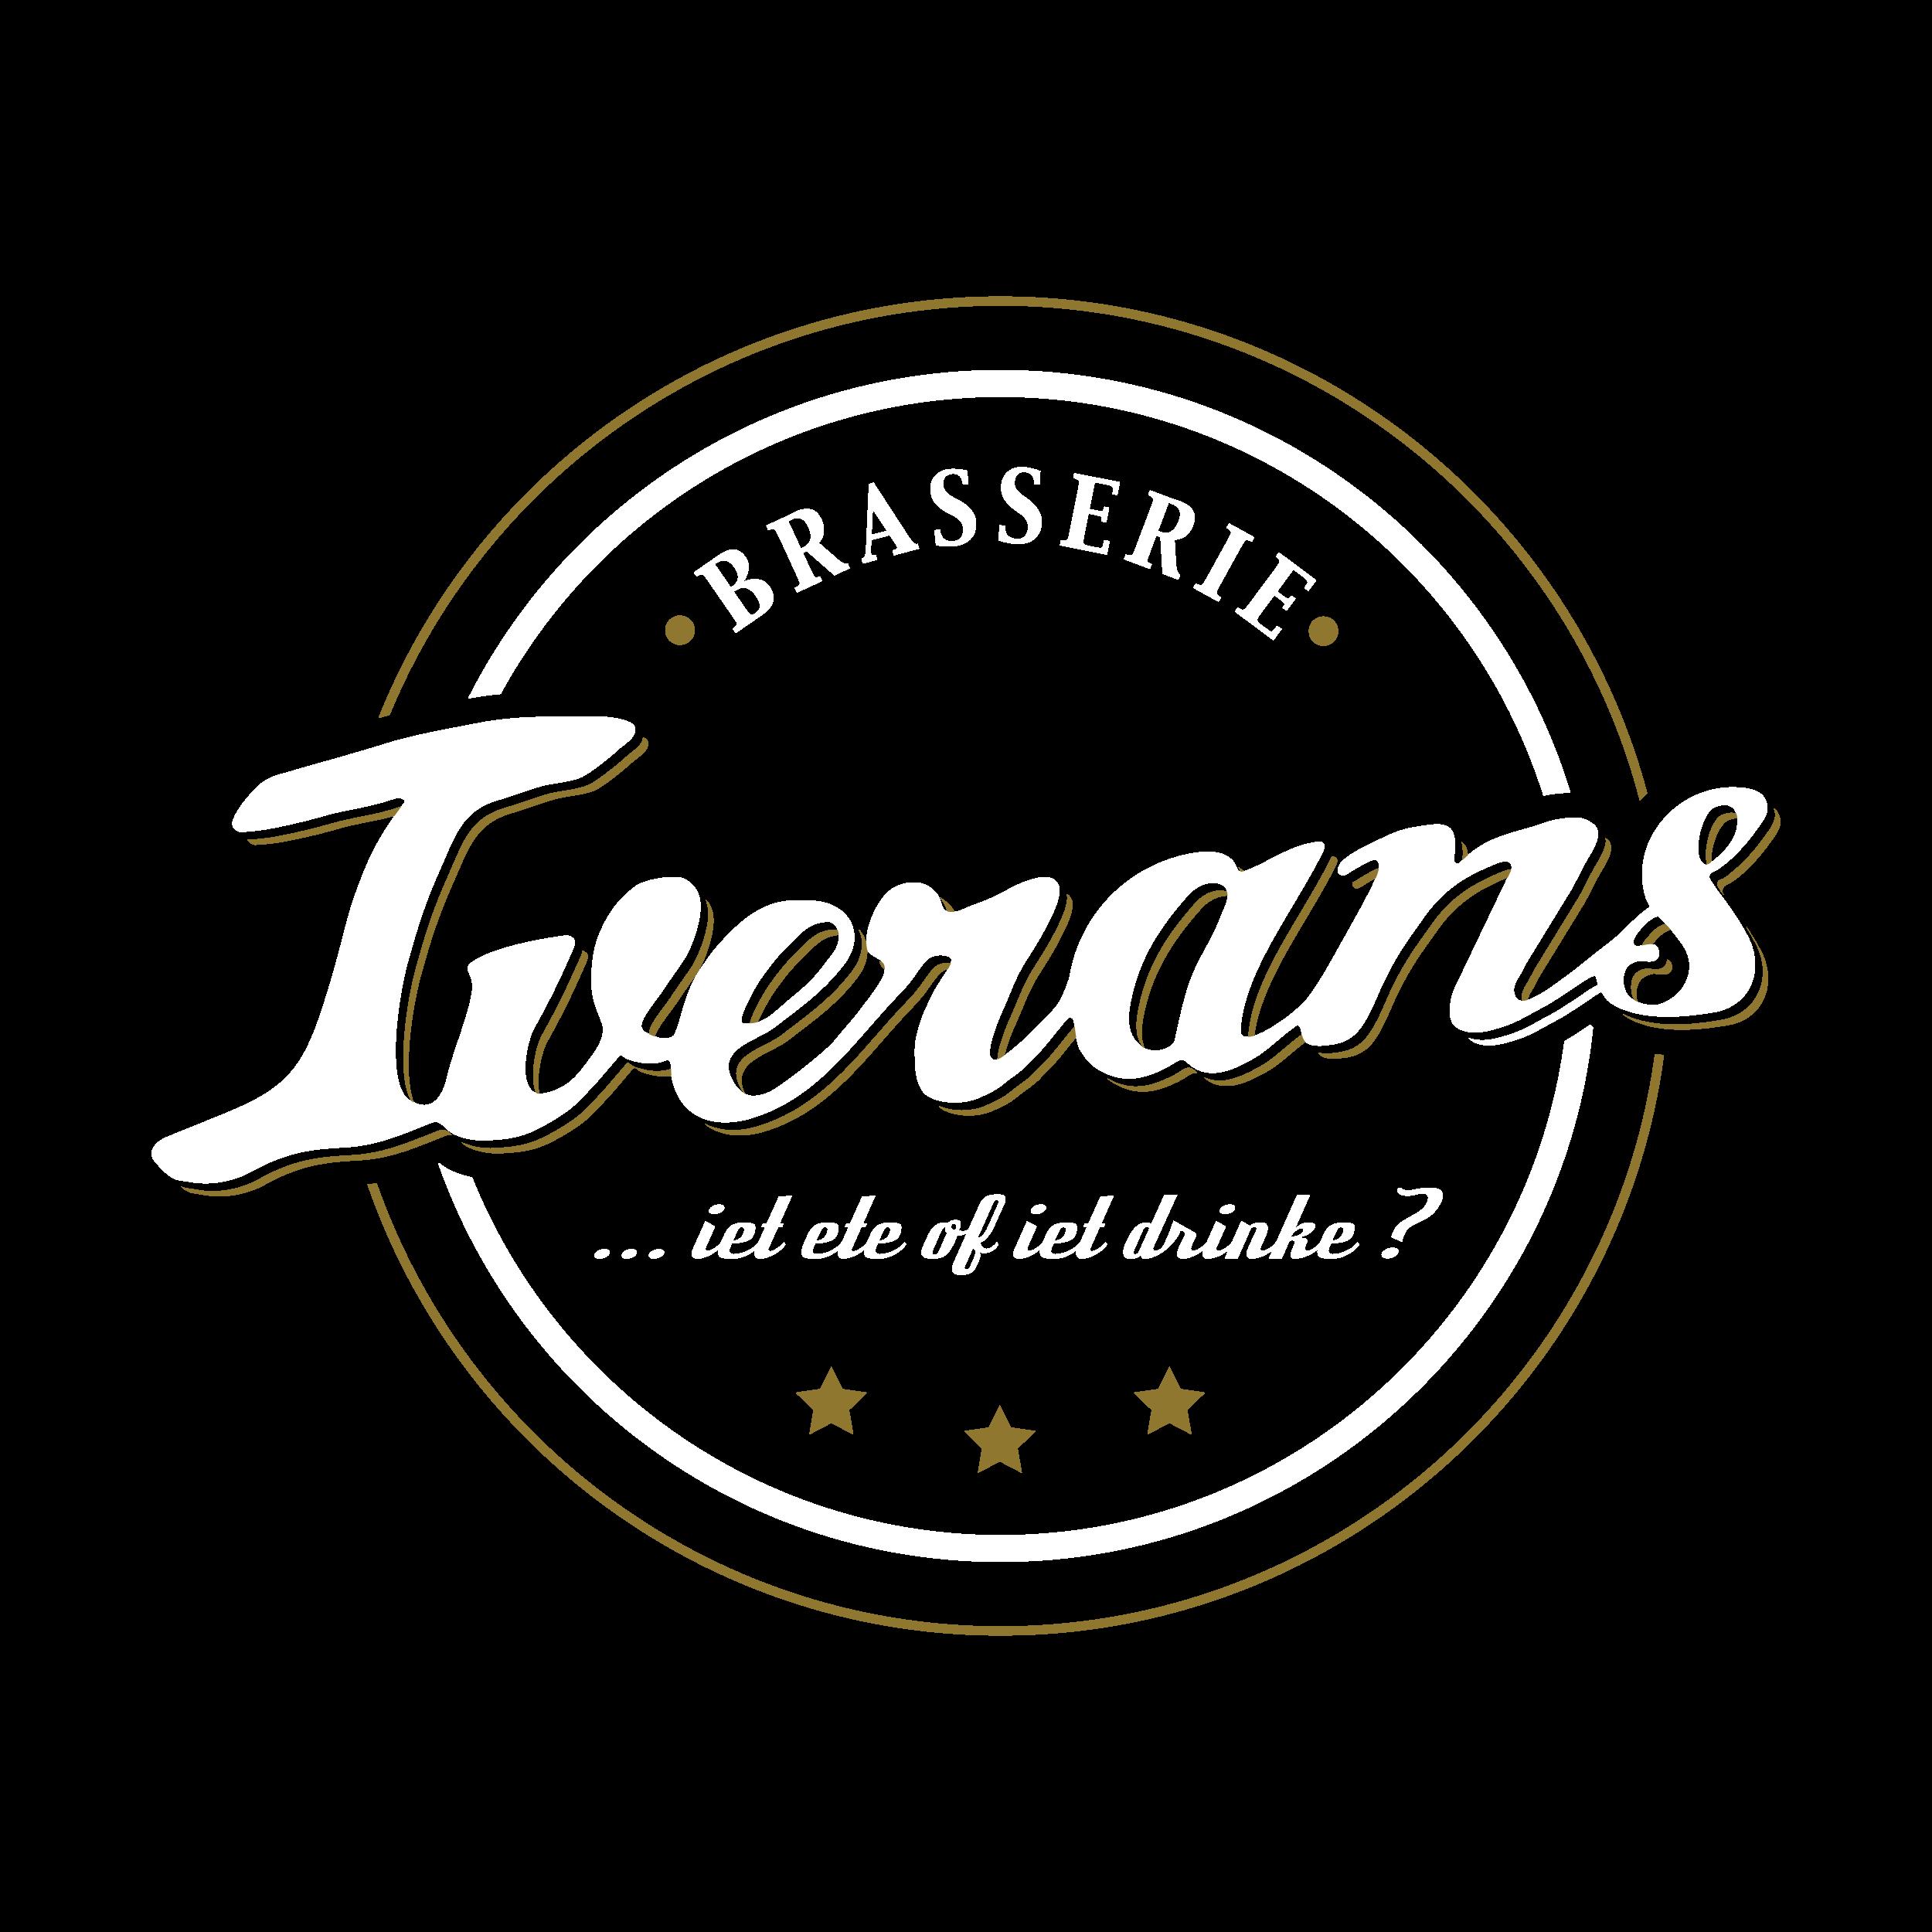 iverans